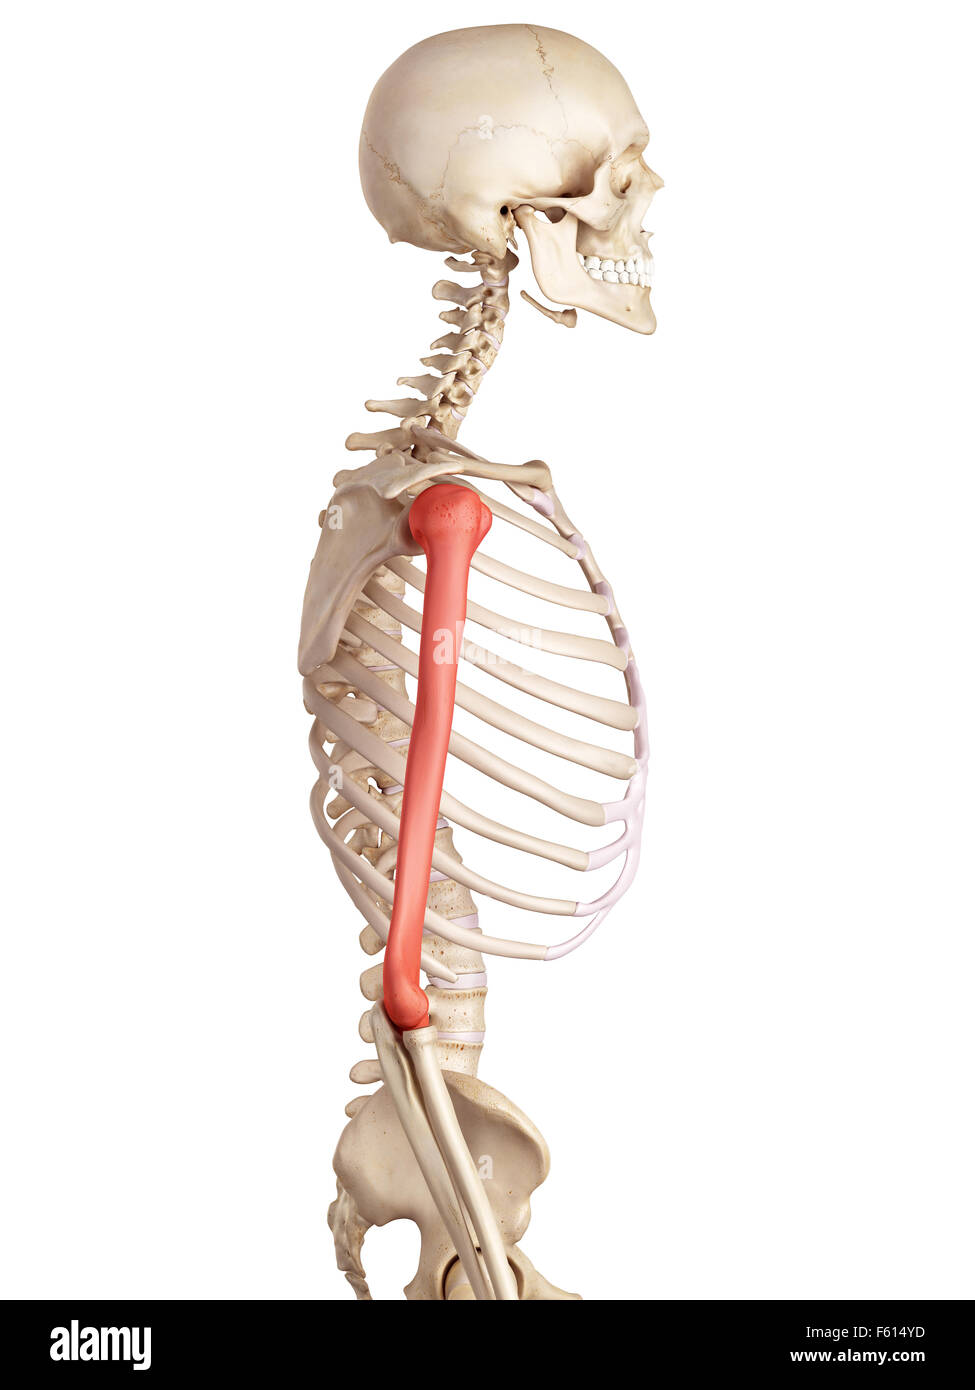 medizinische genaue Abbildung des Humerus Knochens Stockbild